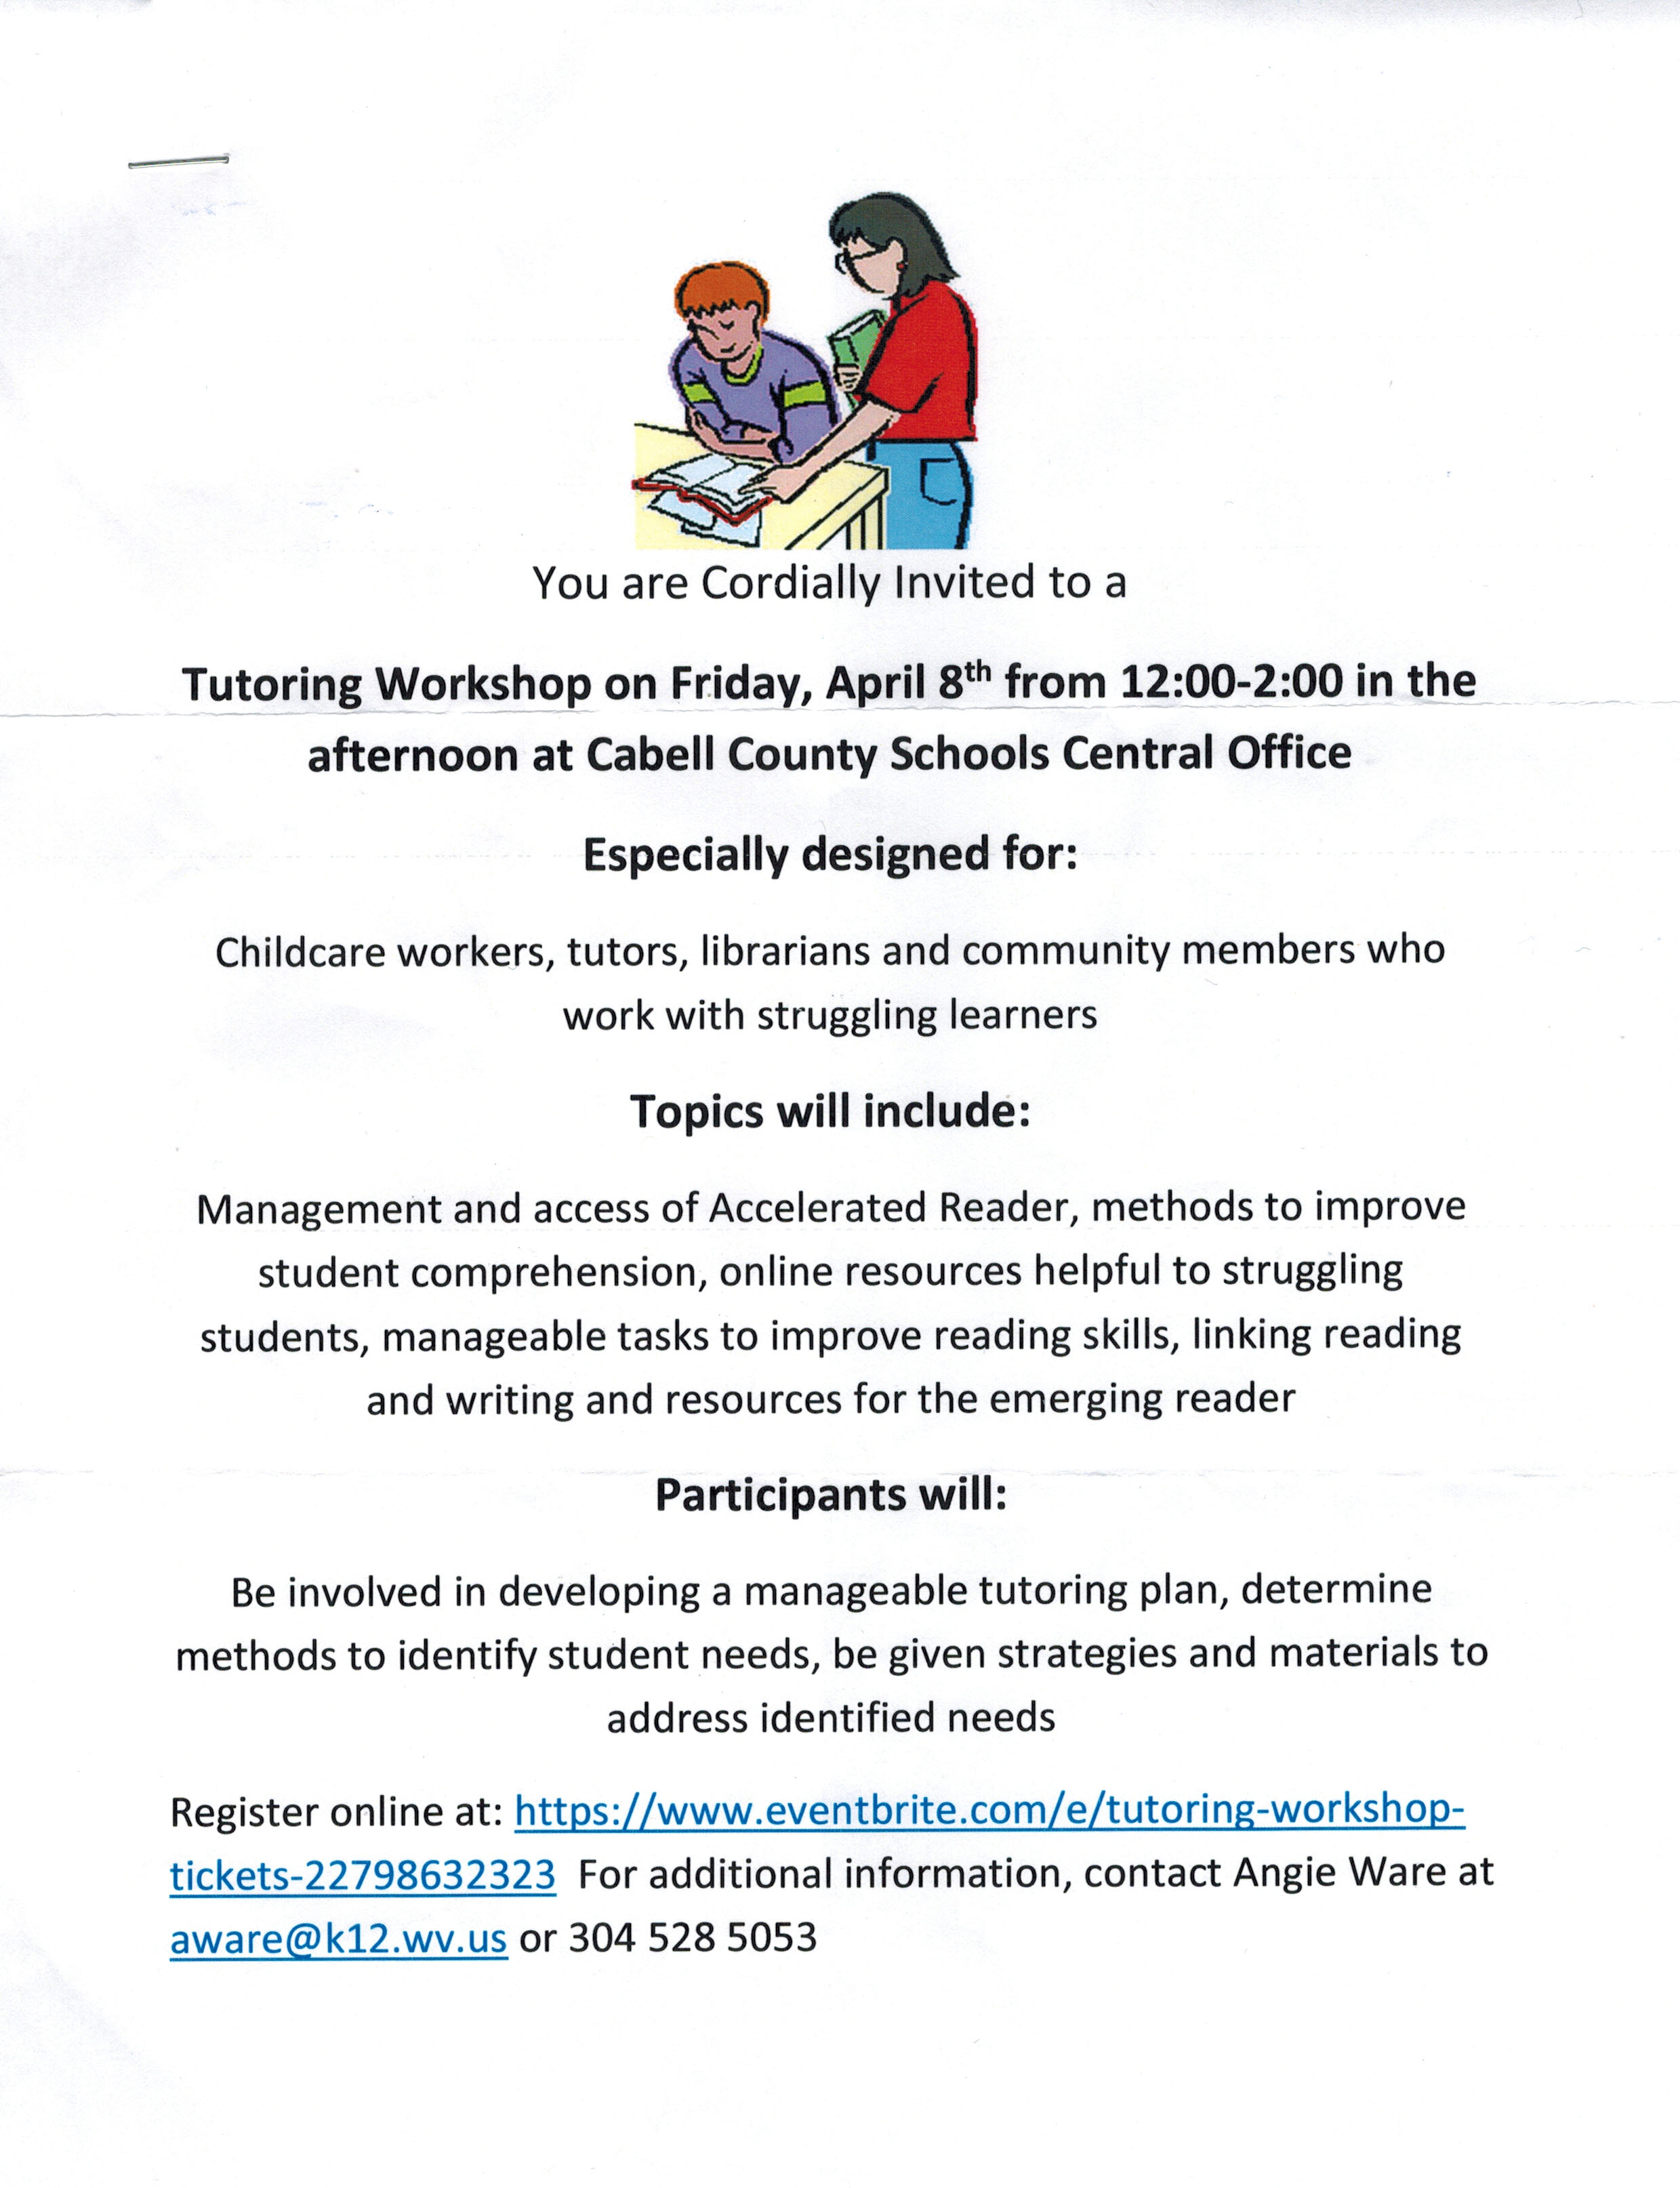 Cabell County Tutoring Workshop 4-8-16 JPEG